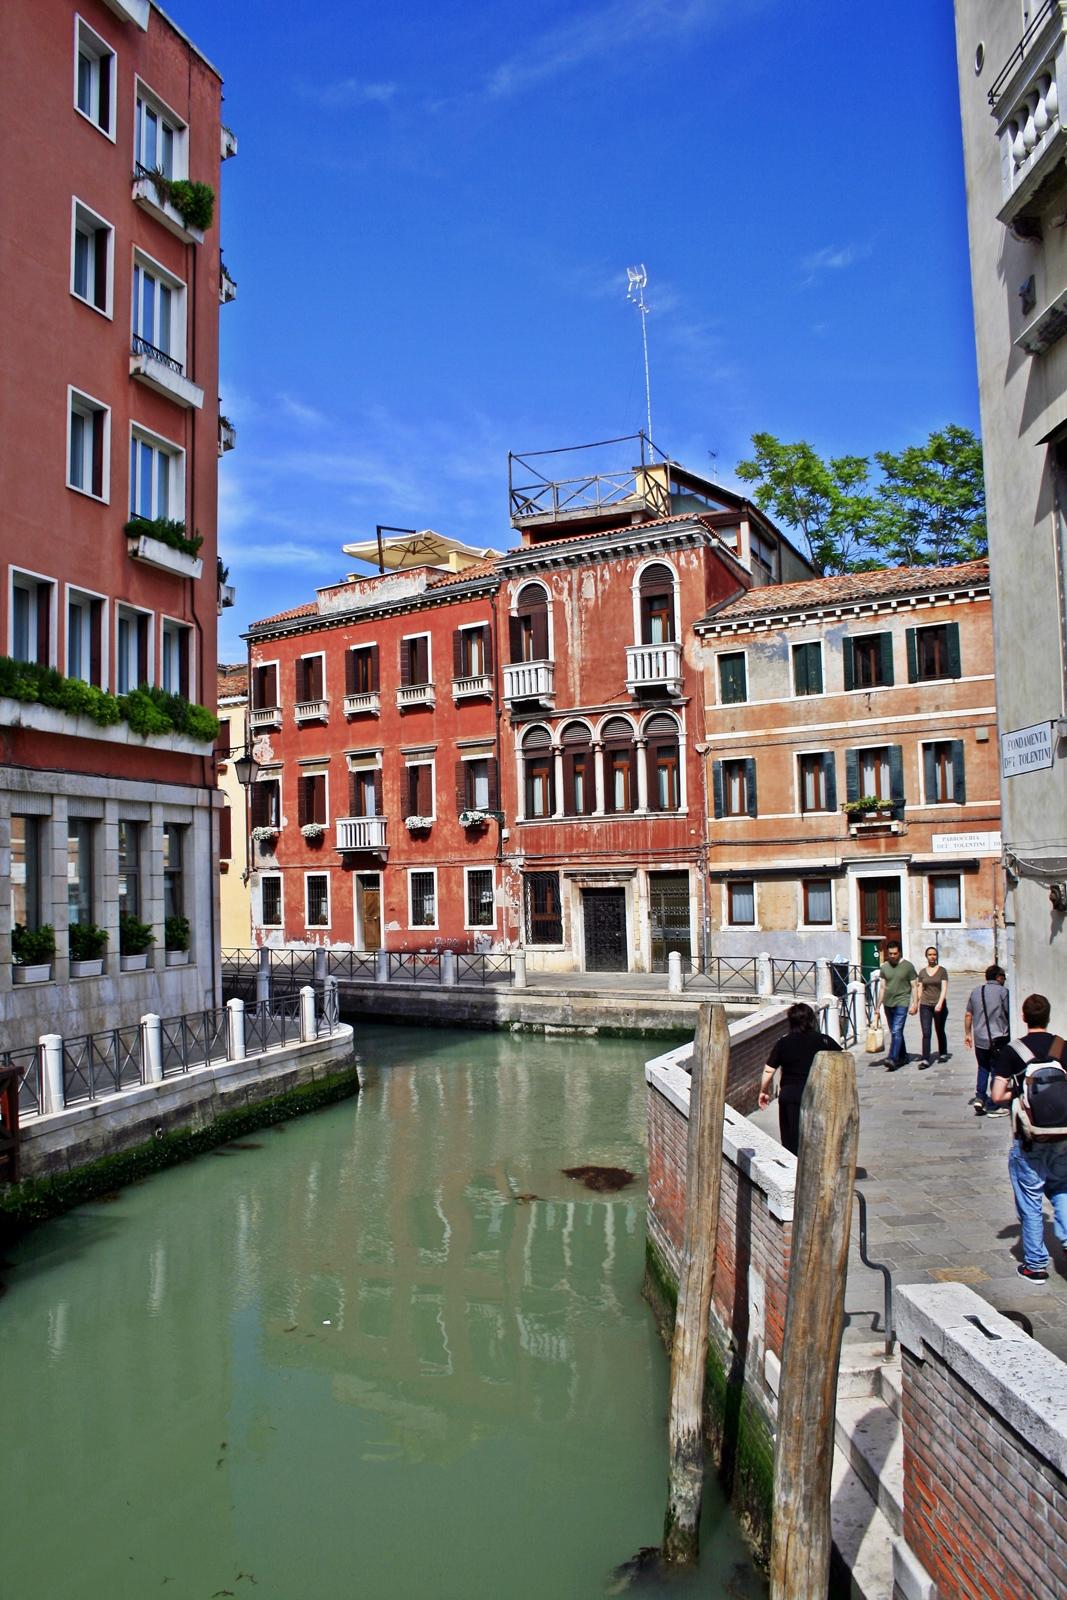 venice italy canals buildings was ist los